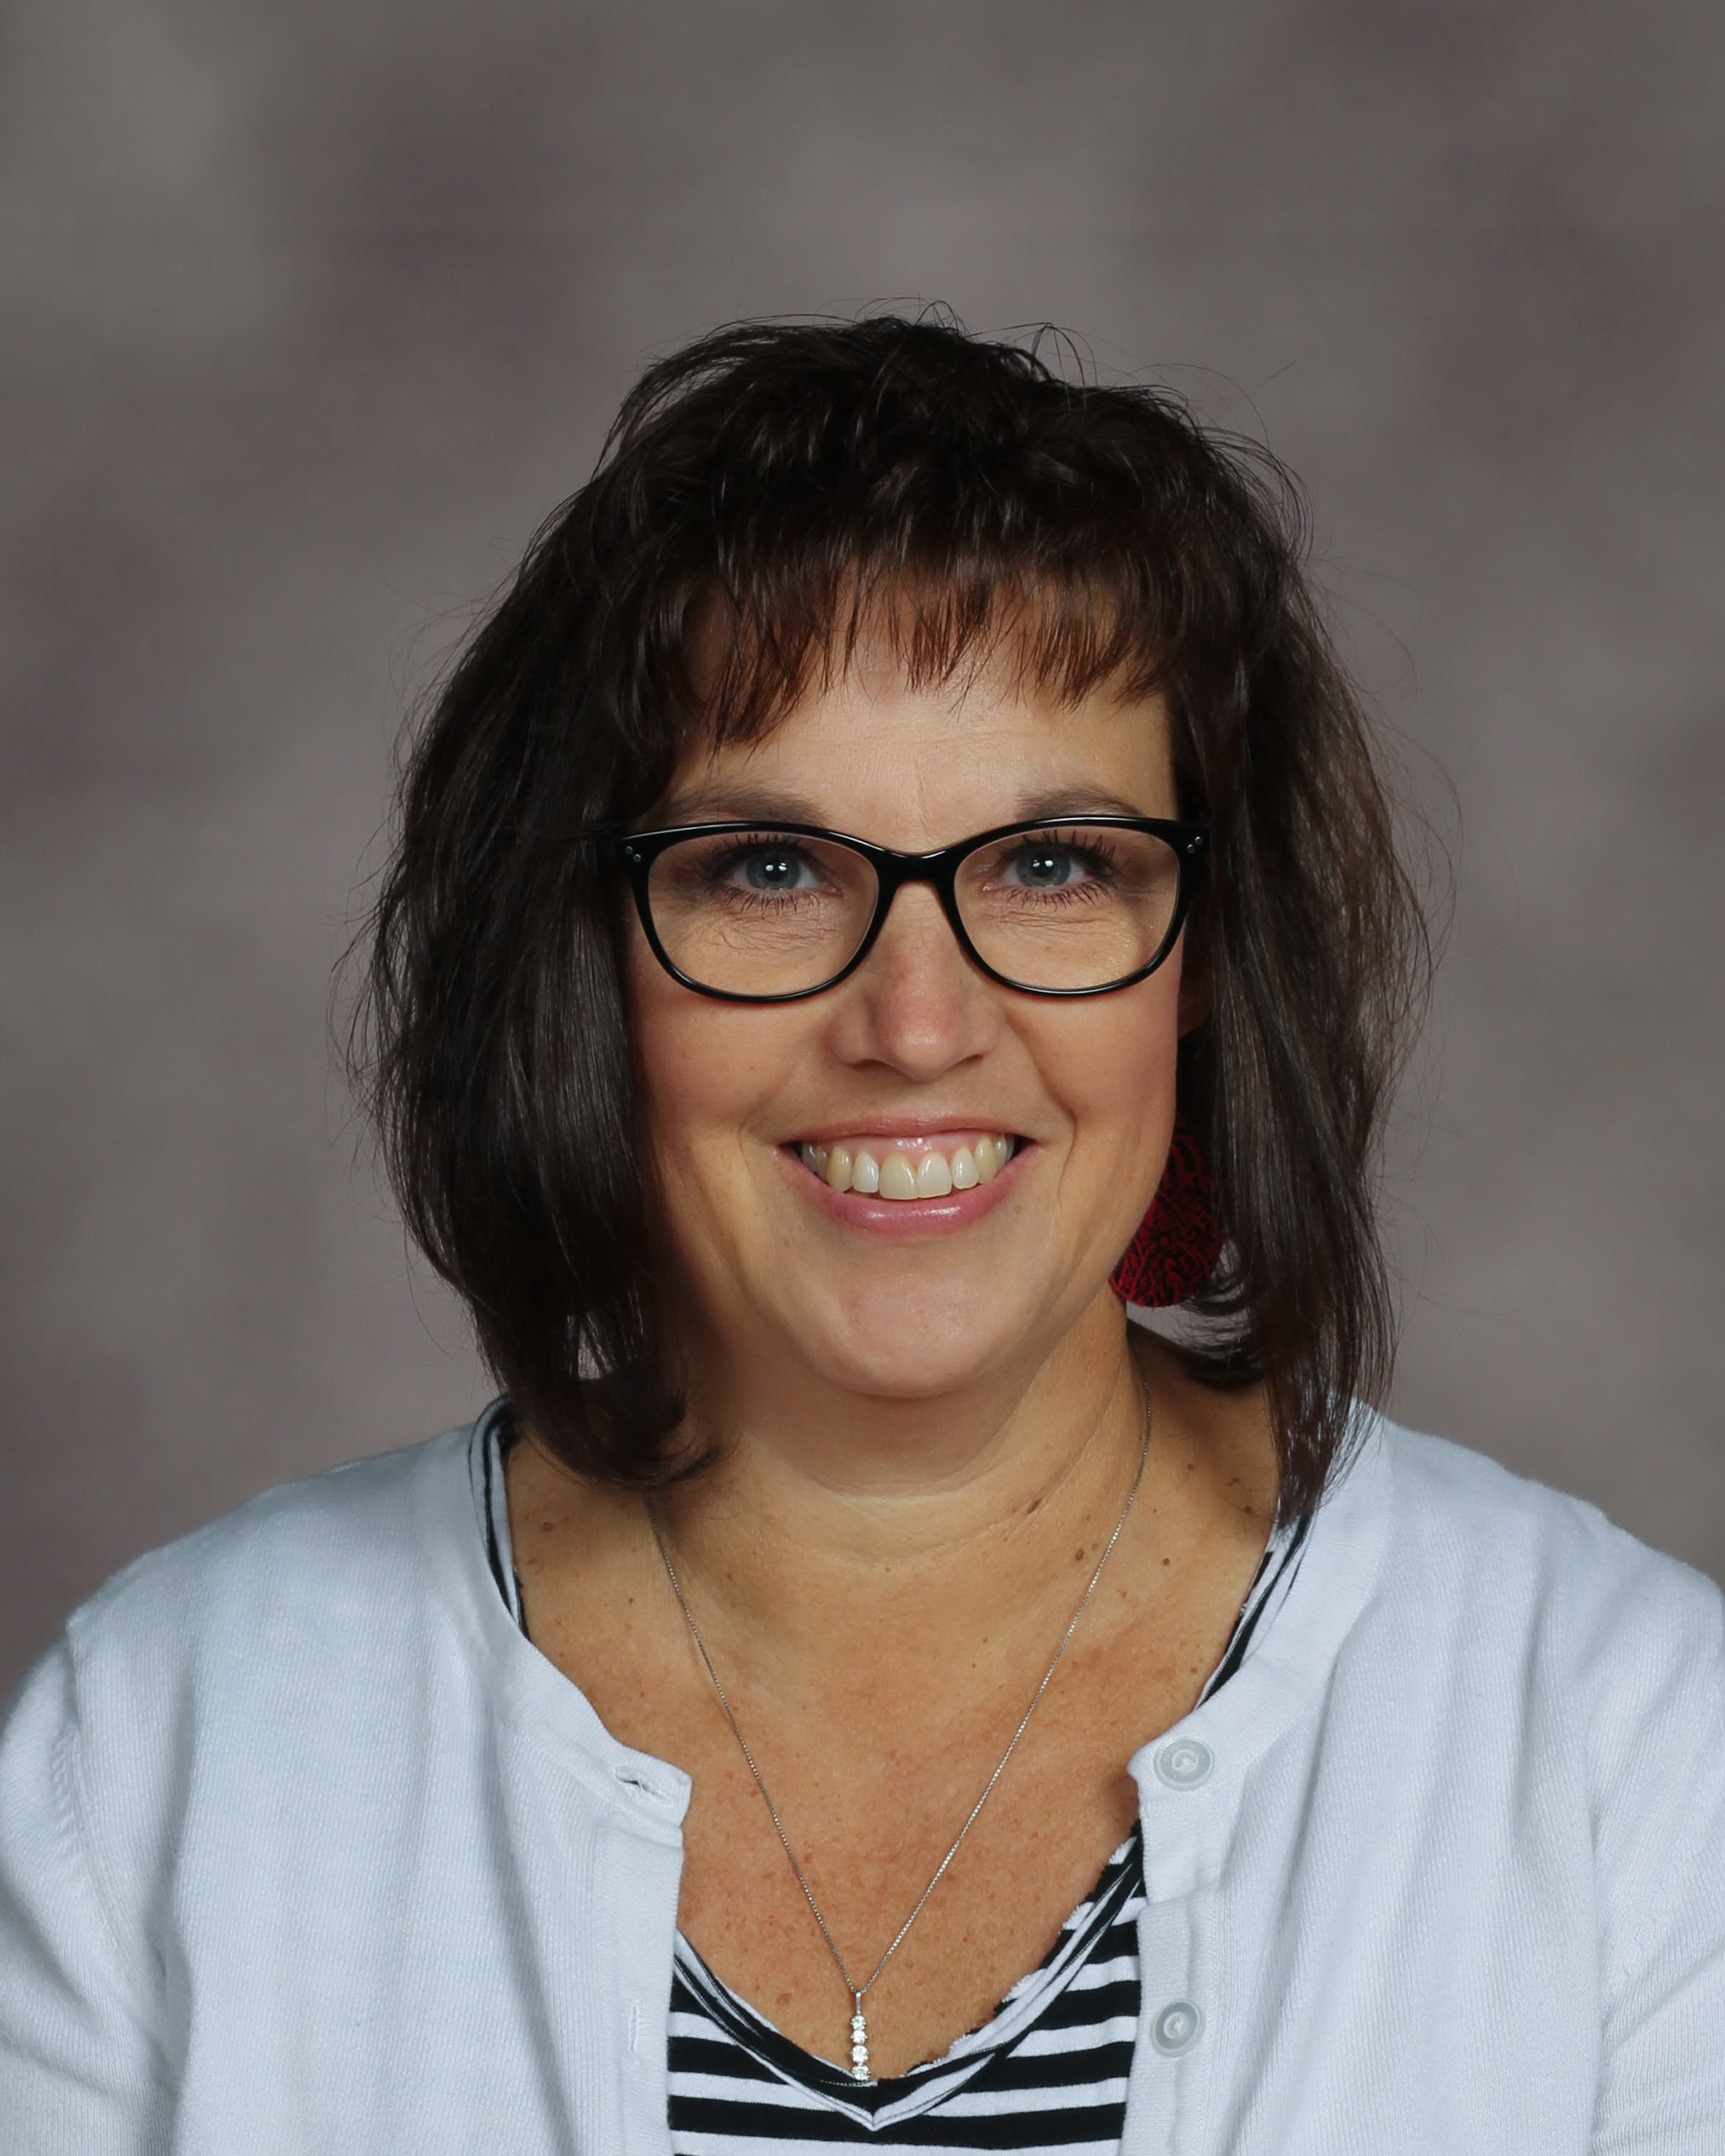 Photo of Tricia Adkinson, Human Resource Director